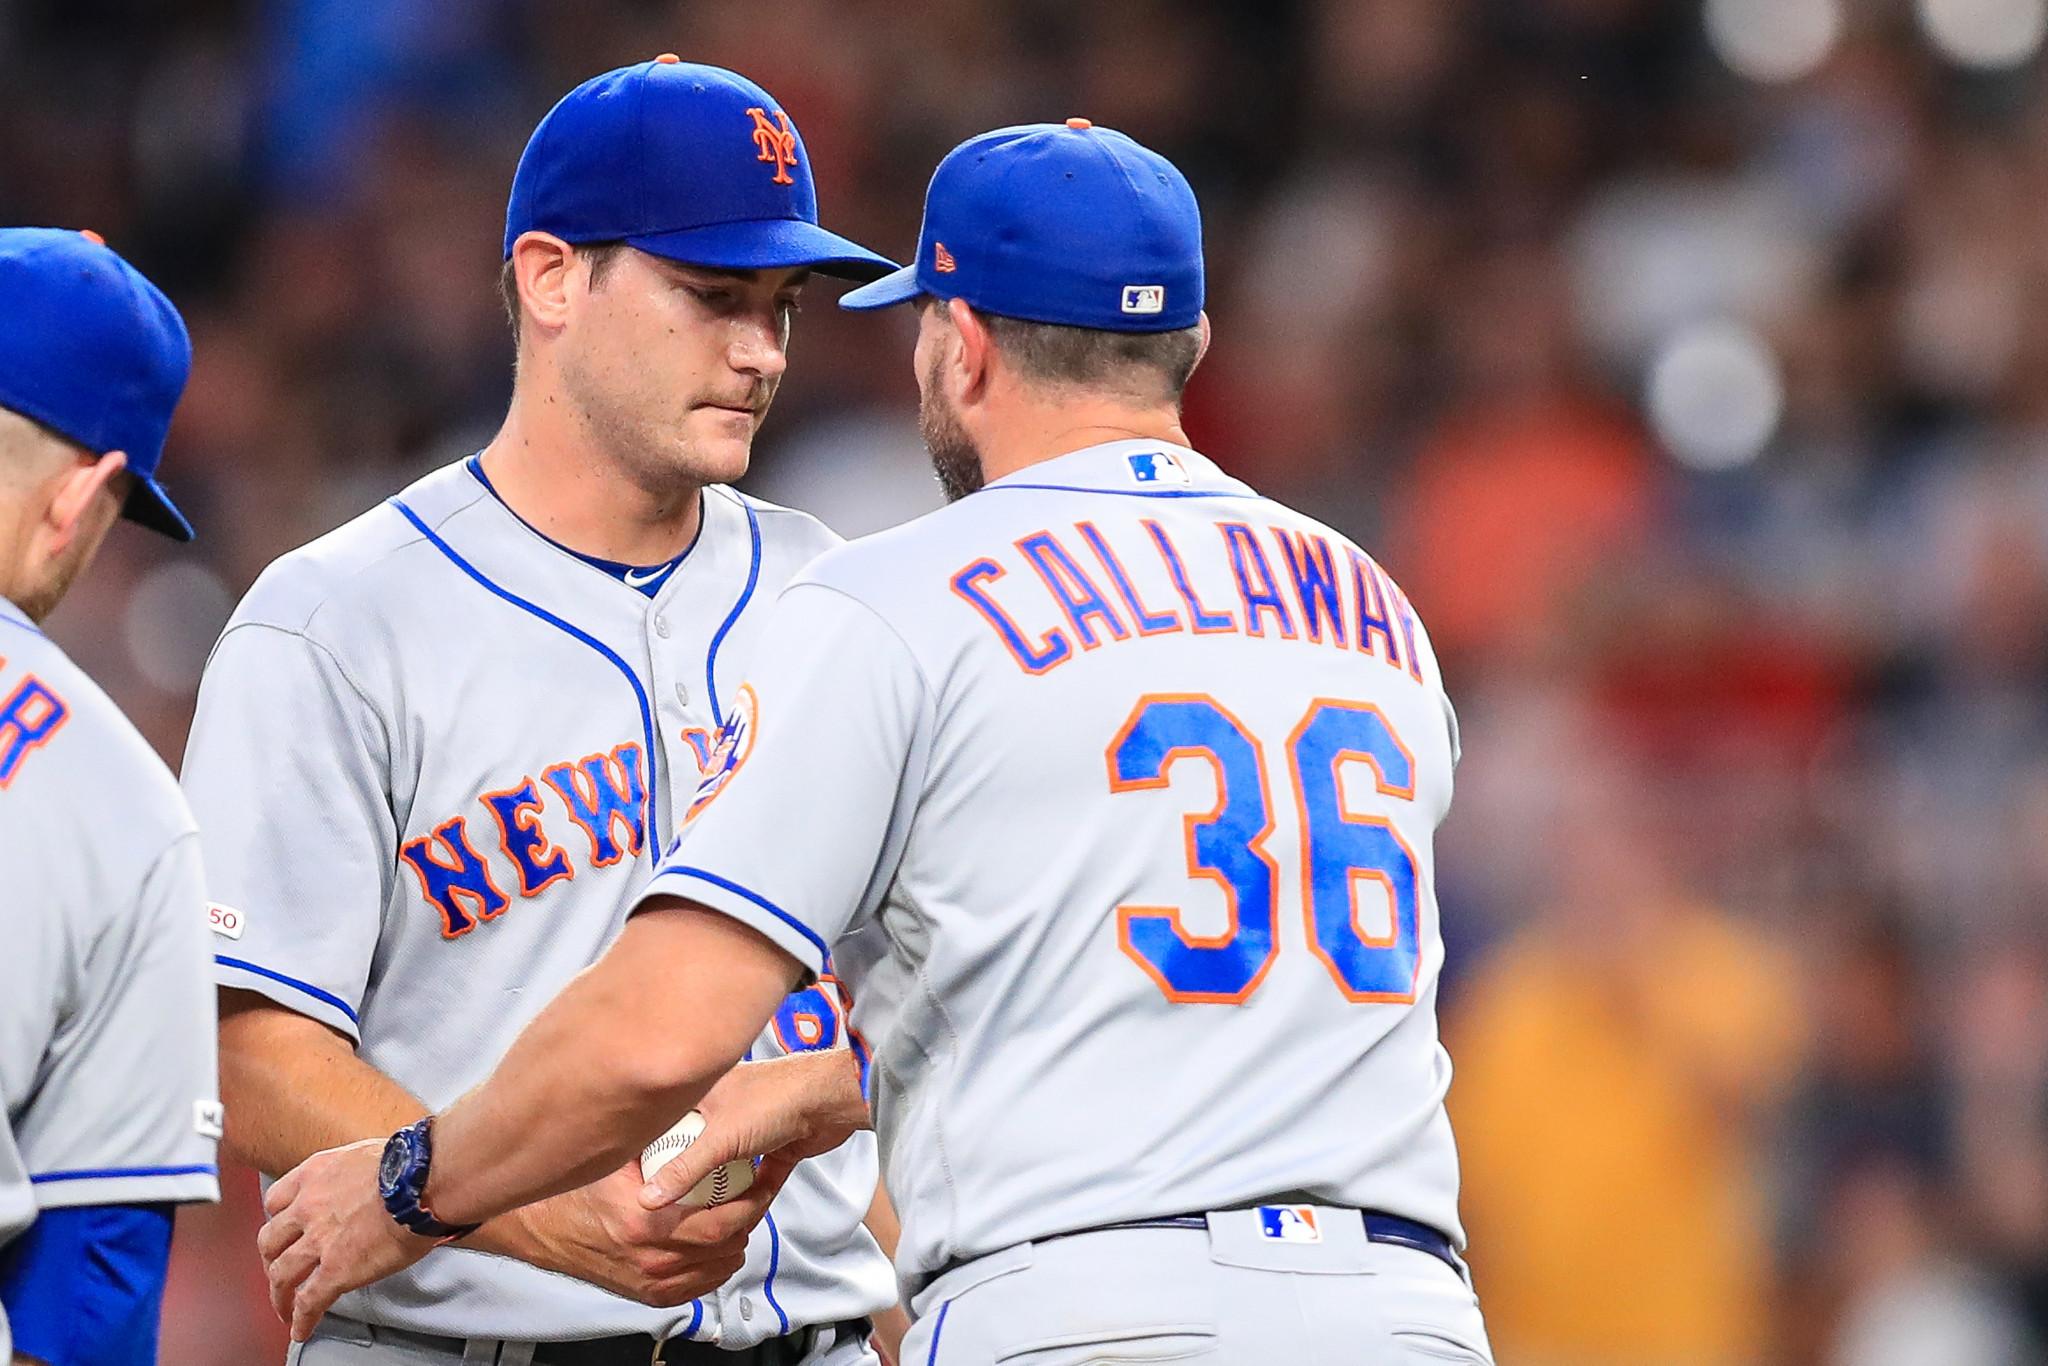 Mickey Callaway had way too much faith in the Mets bullpen